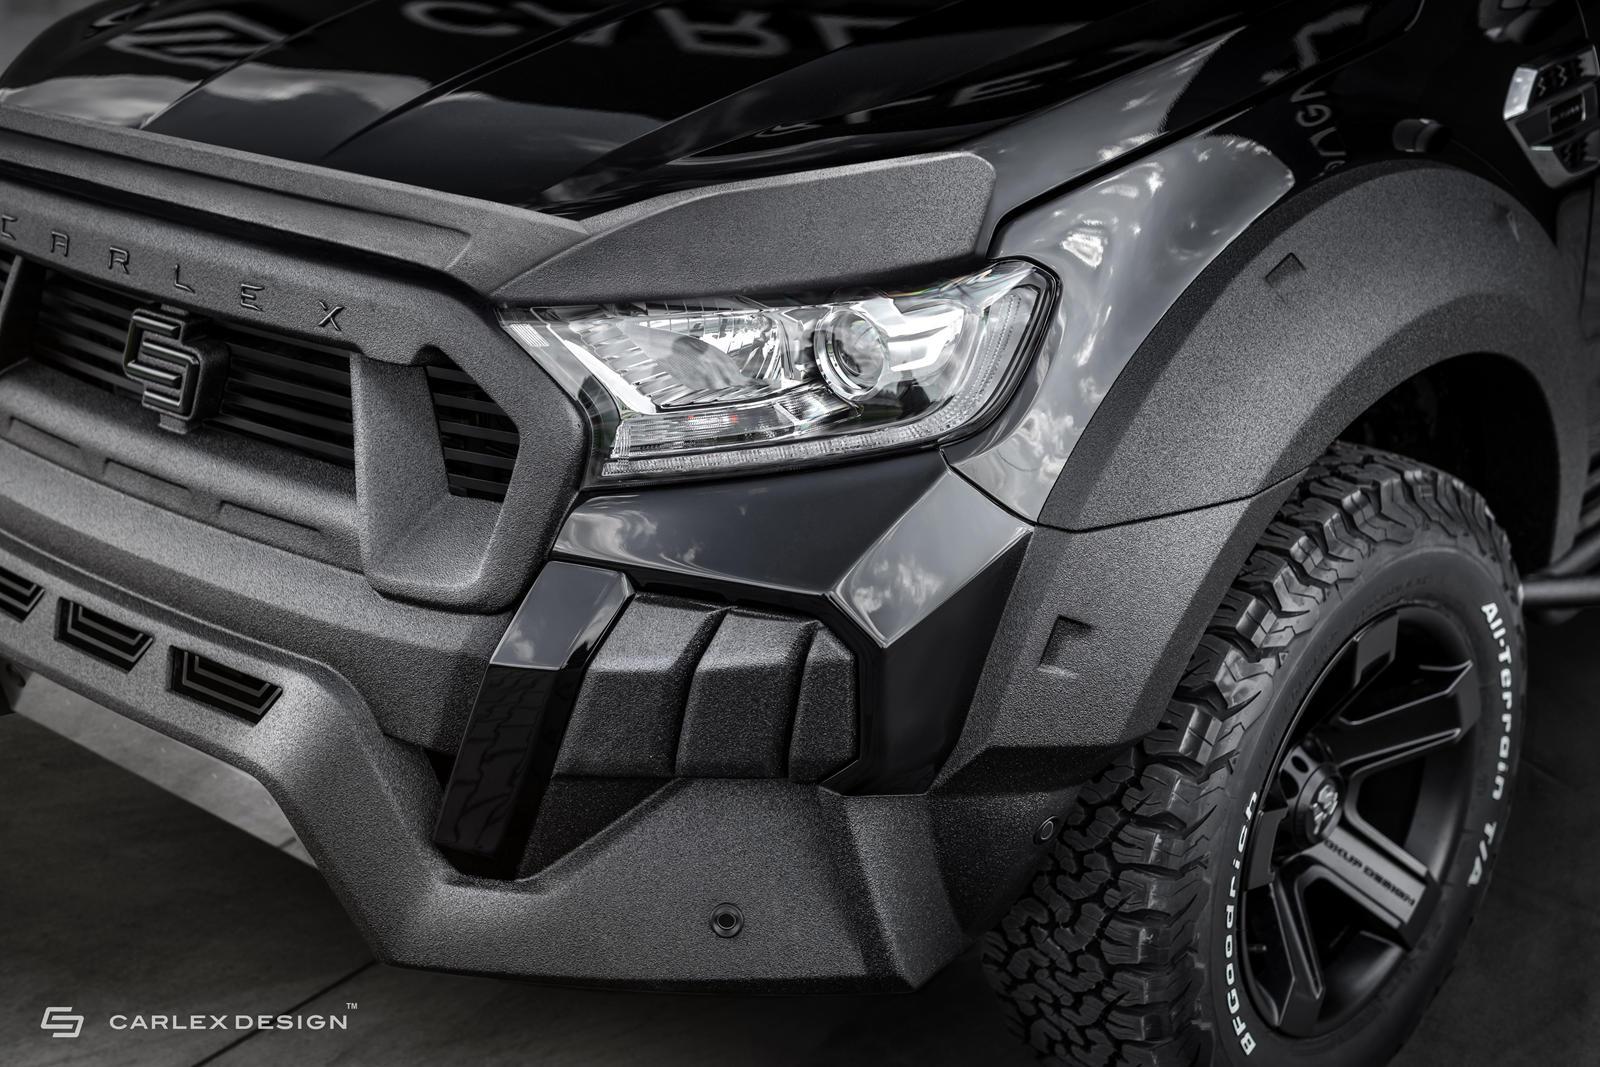 Ford_Ranger_Carlex_Design_0005